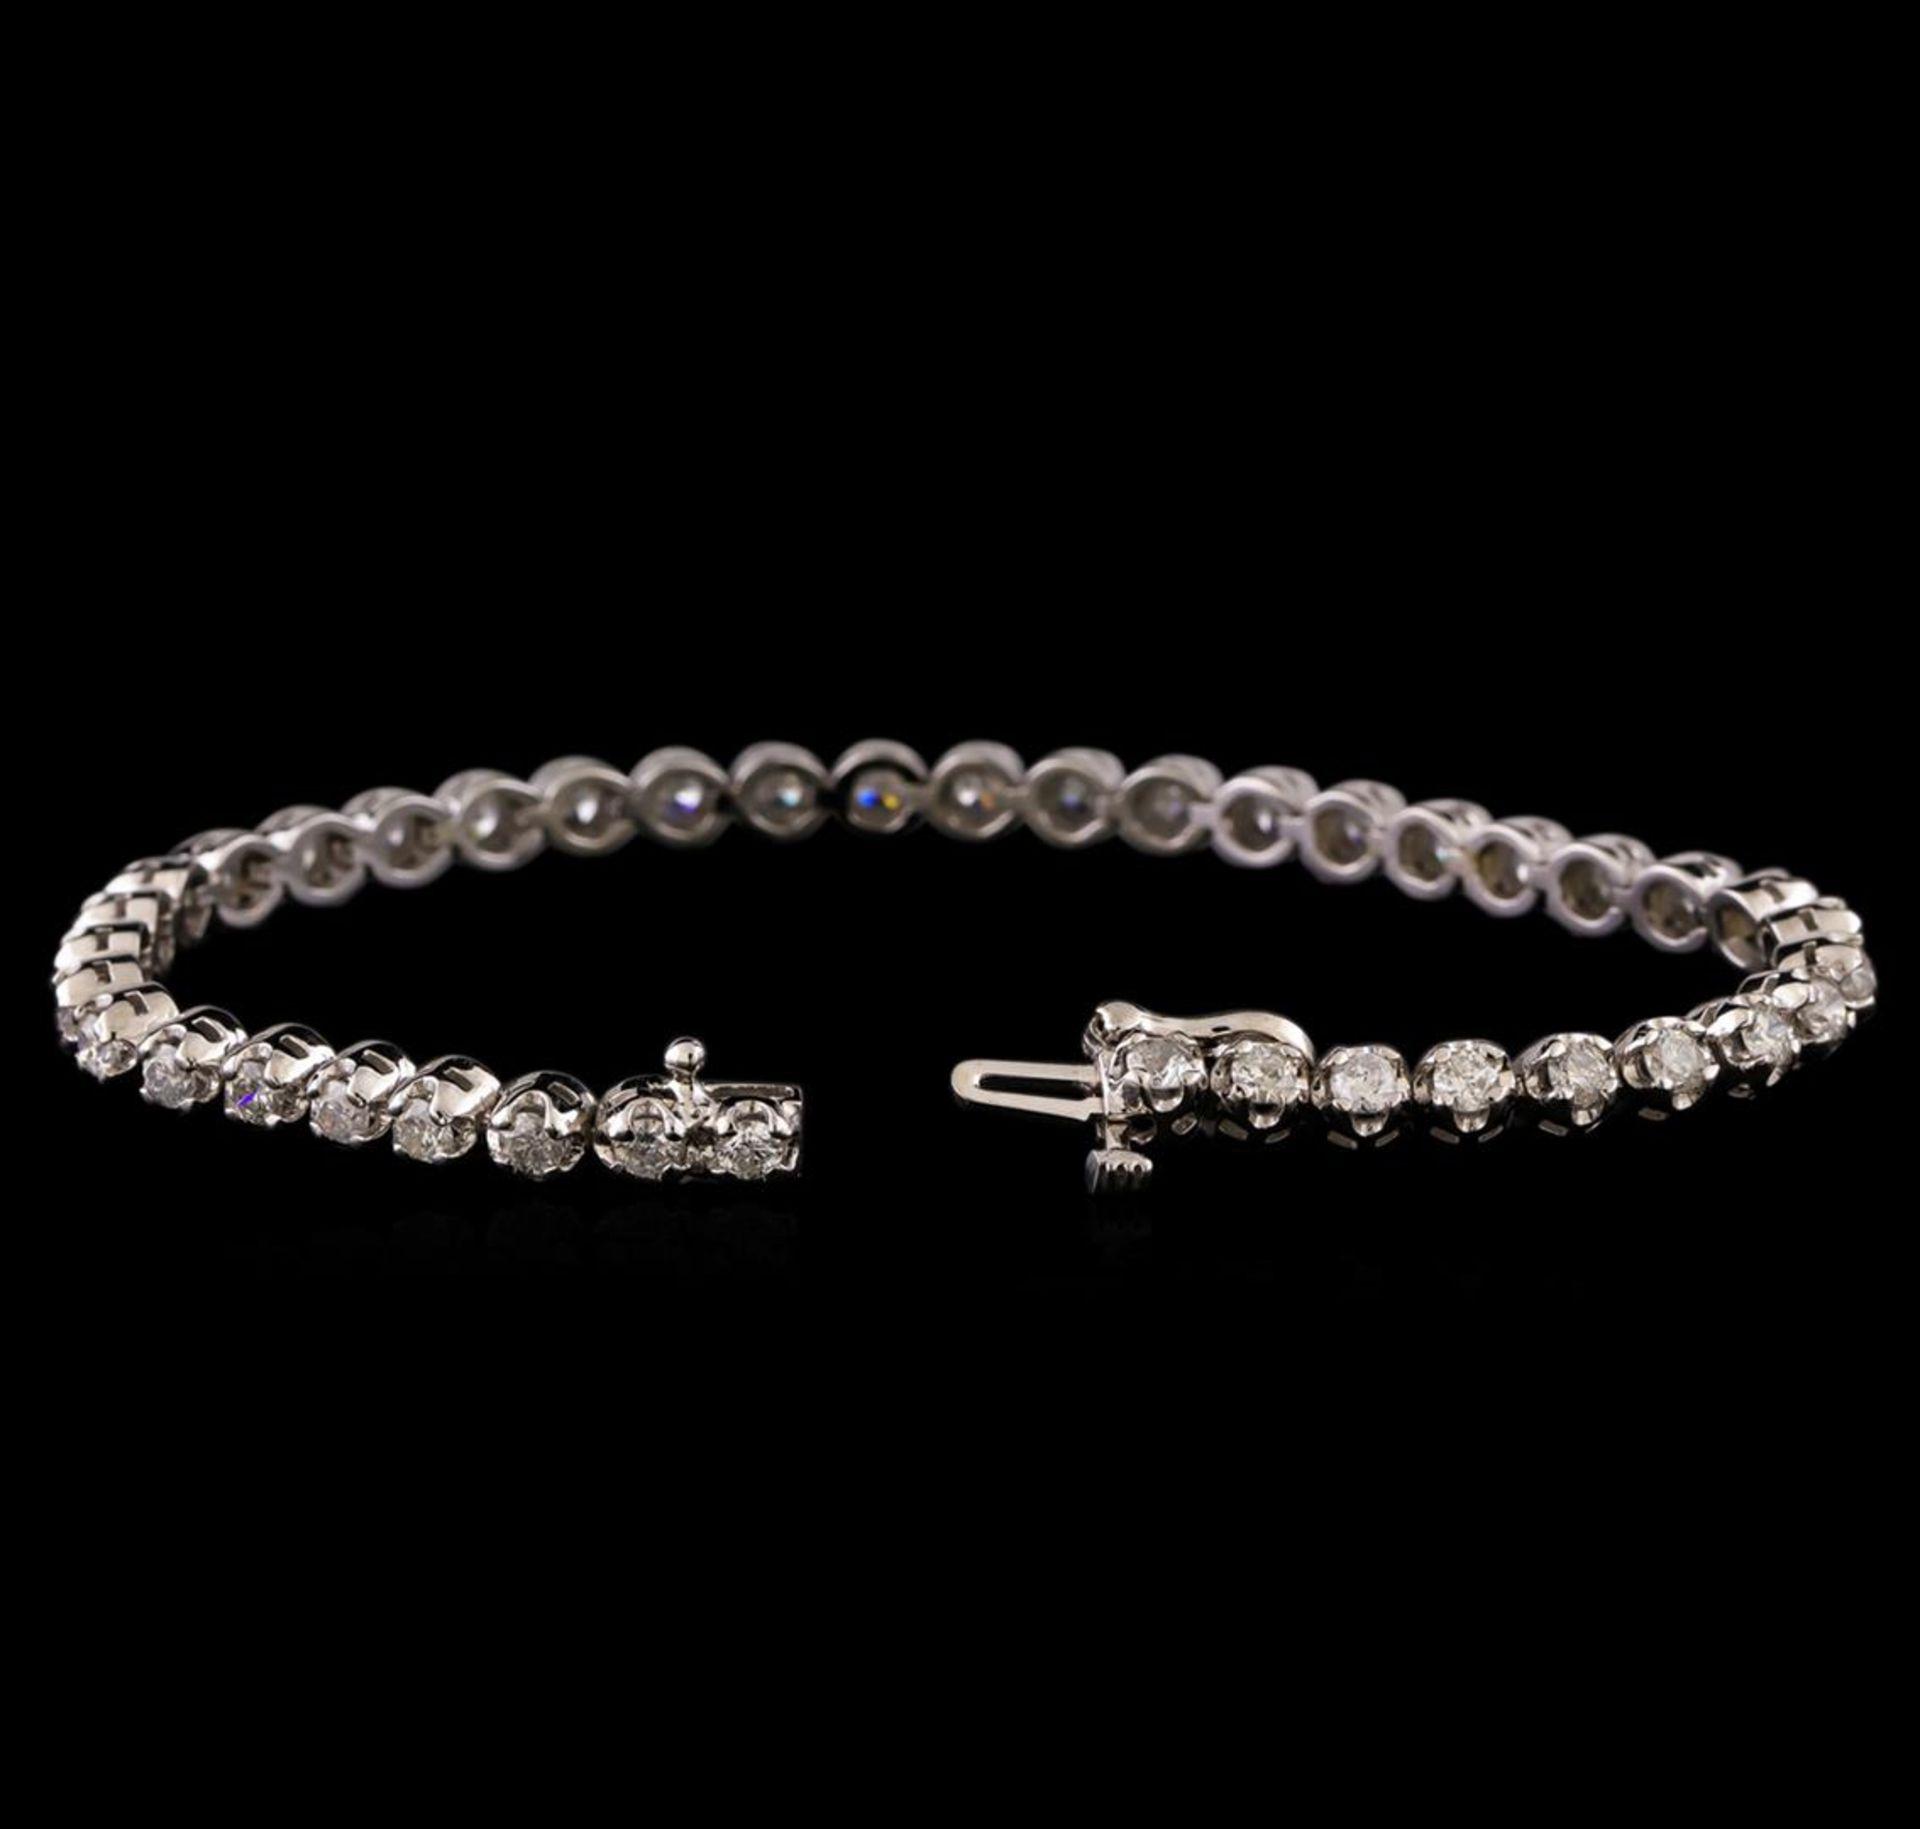 14KT White Gold 3.02 ctw Diamond Tennis Bracelet - Image 3 of 4